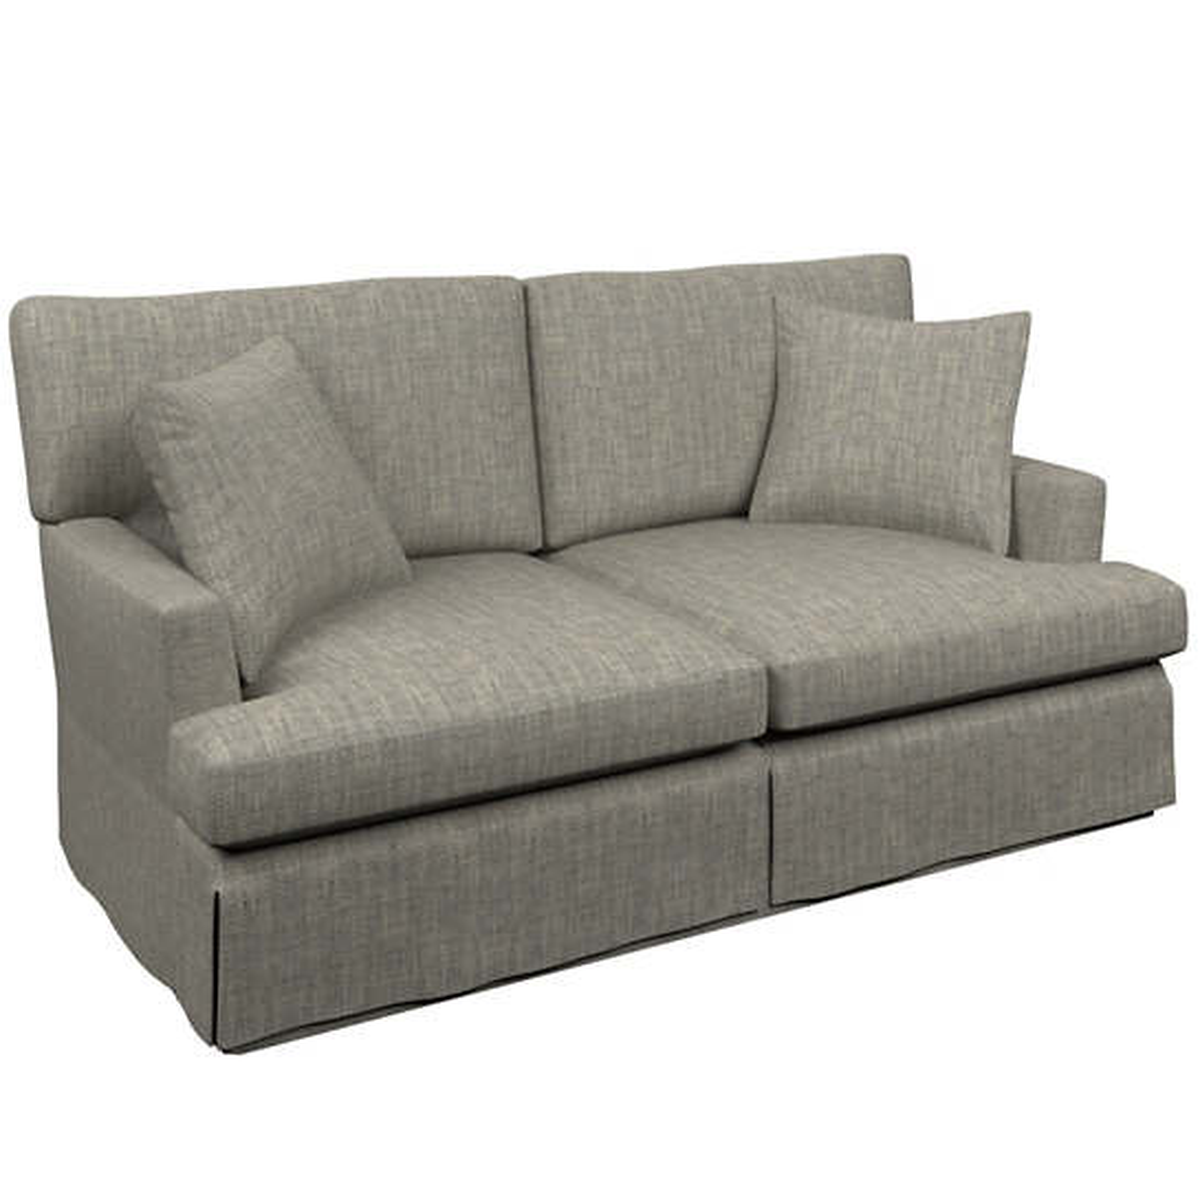 Chevron Indigo Saybrook 2 Seater Sofa